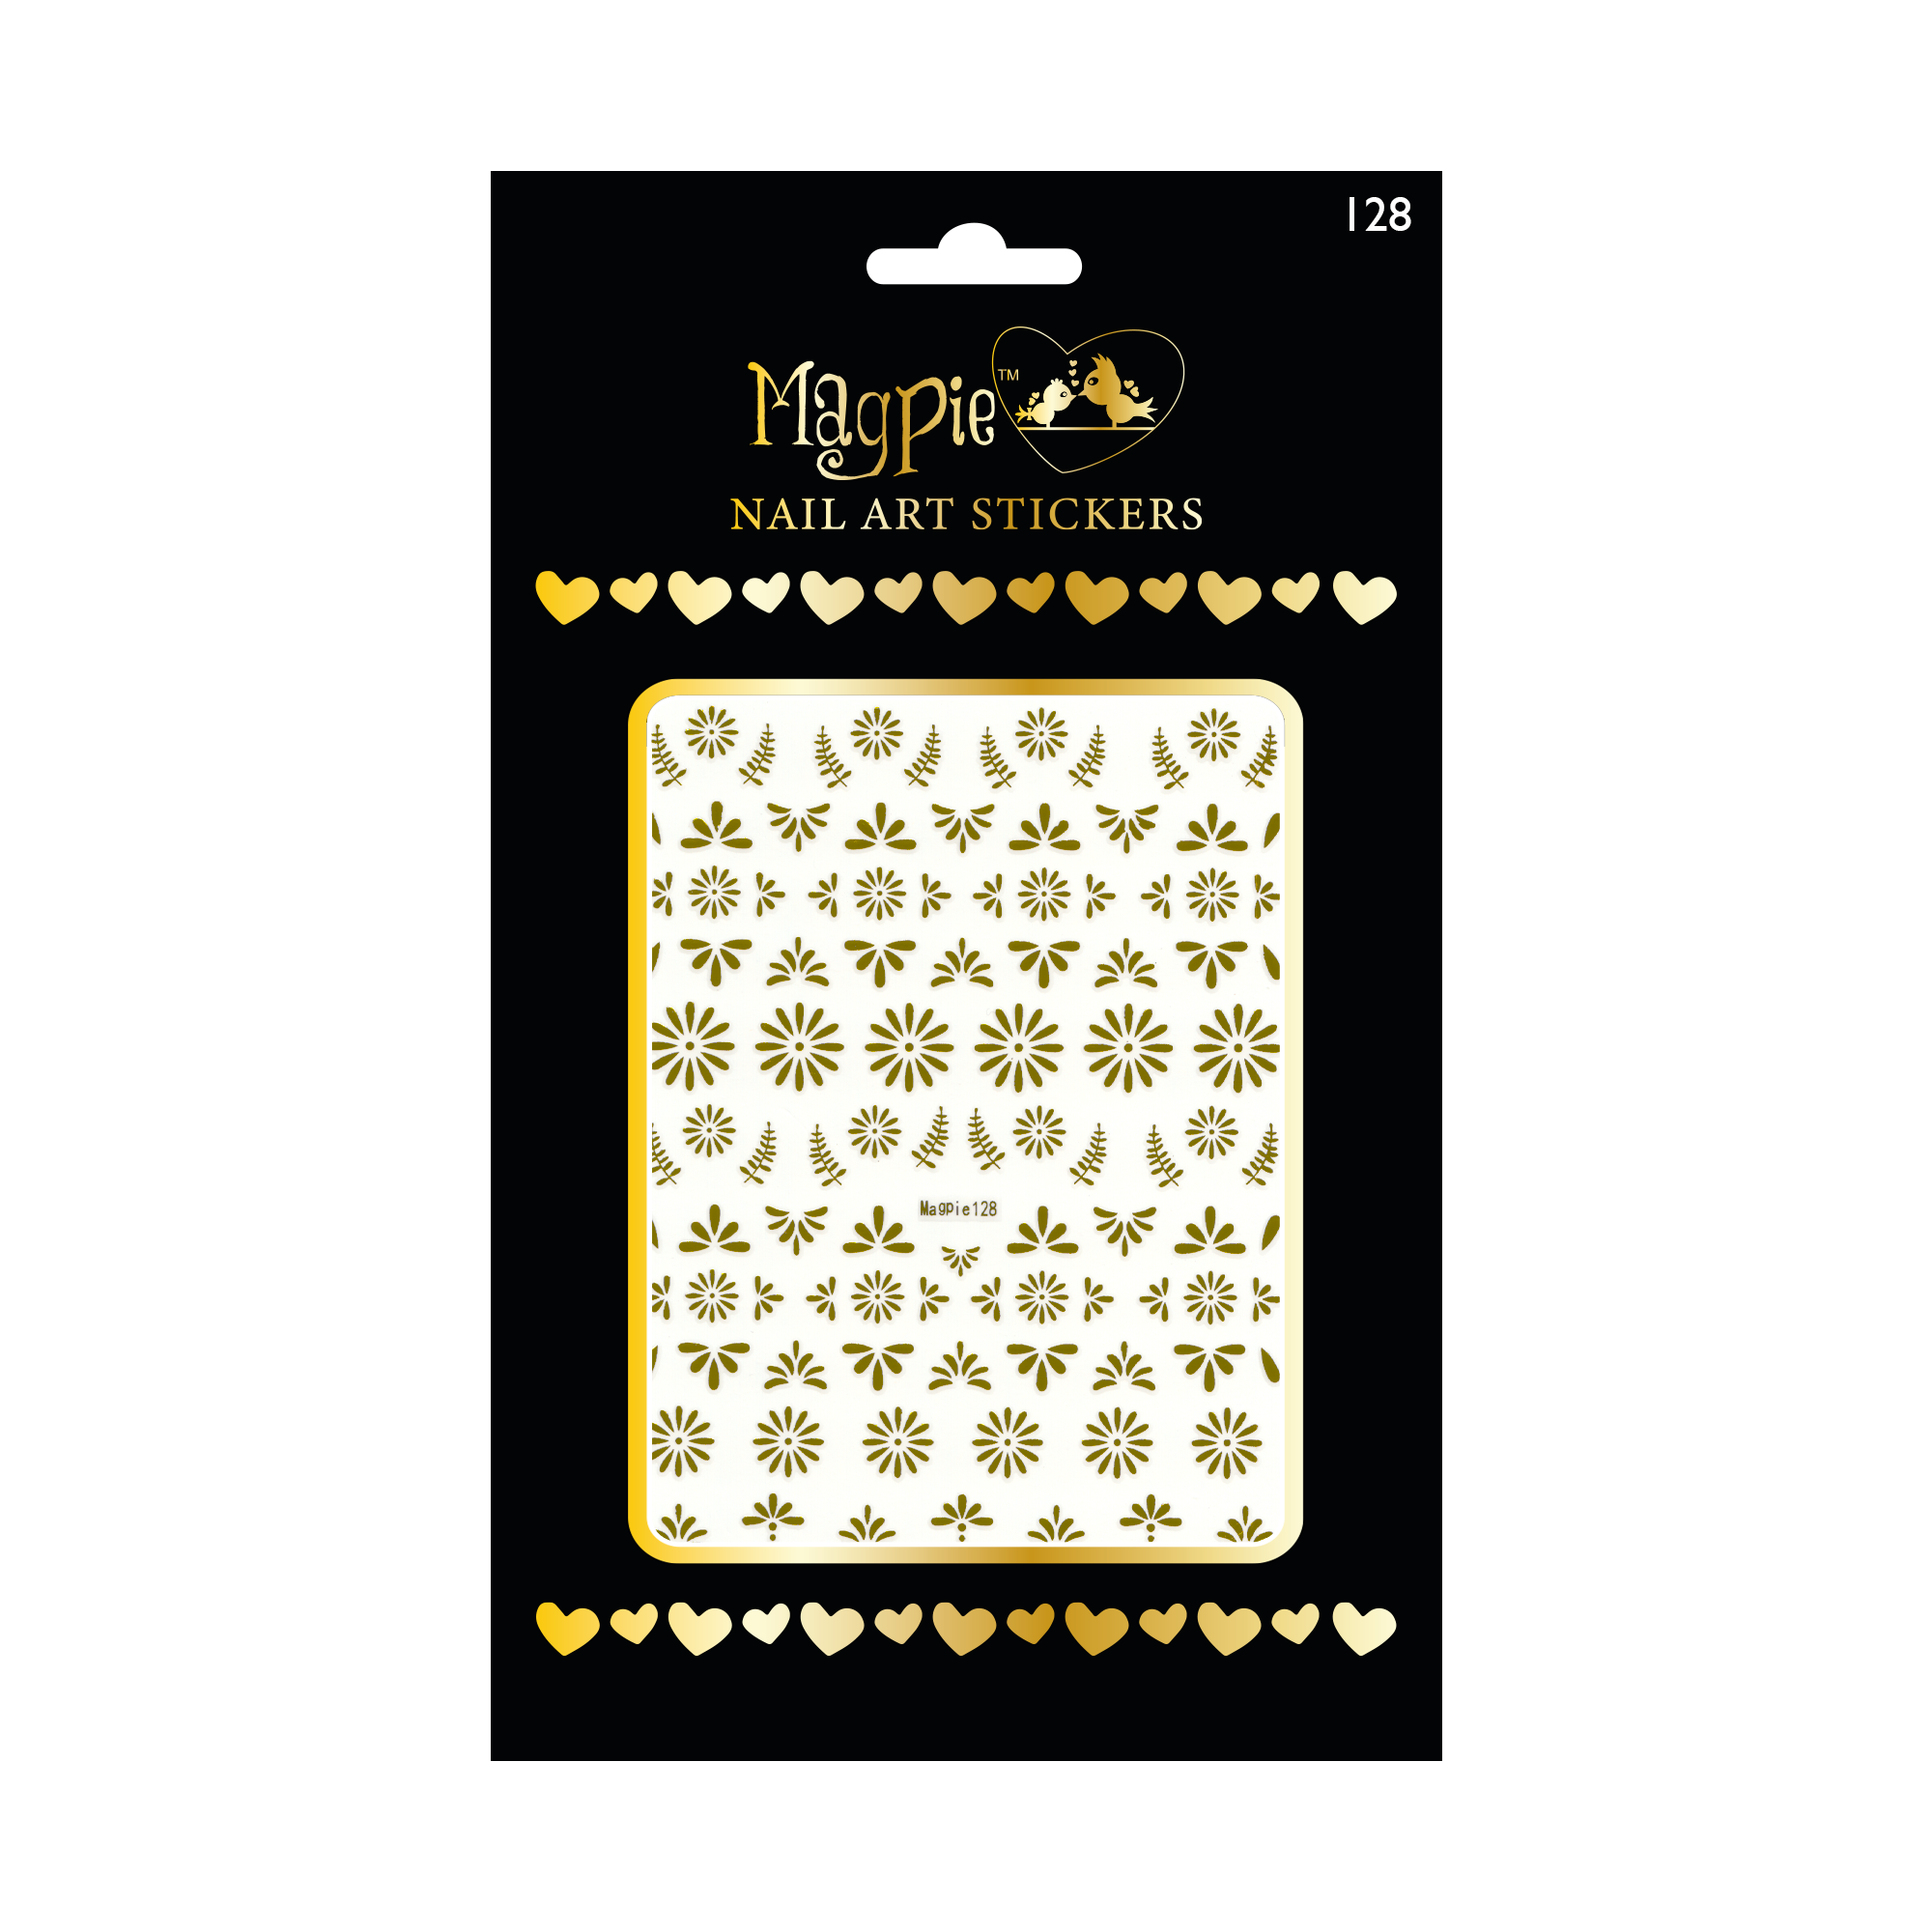 Magpie 128 stickers